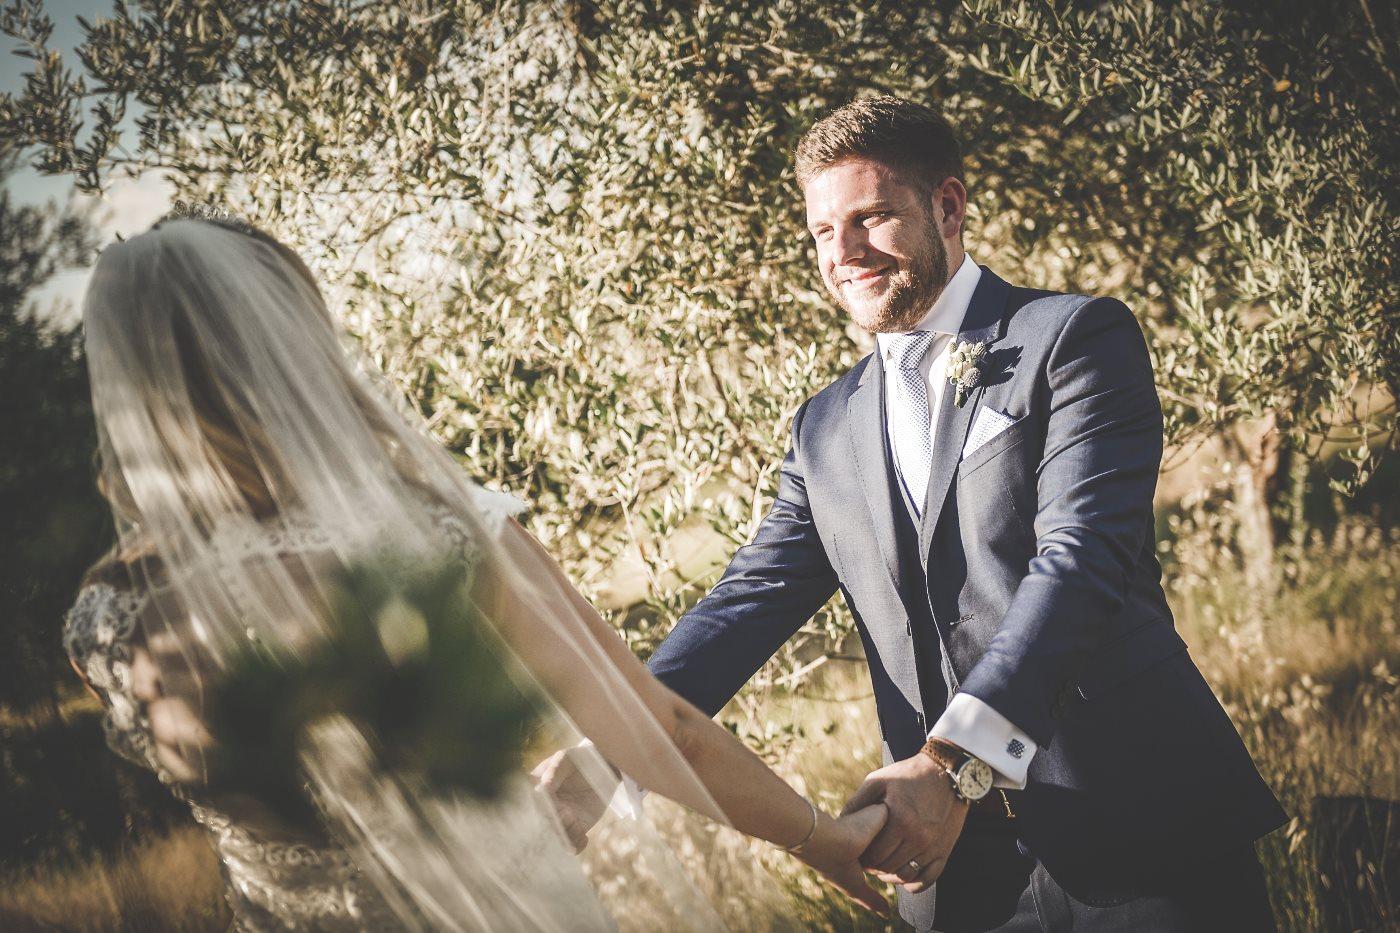 wedding_photos_castello_di_gabbiano_13.jpg